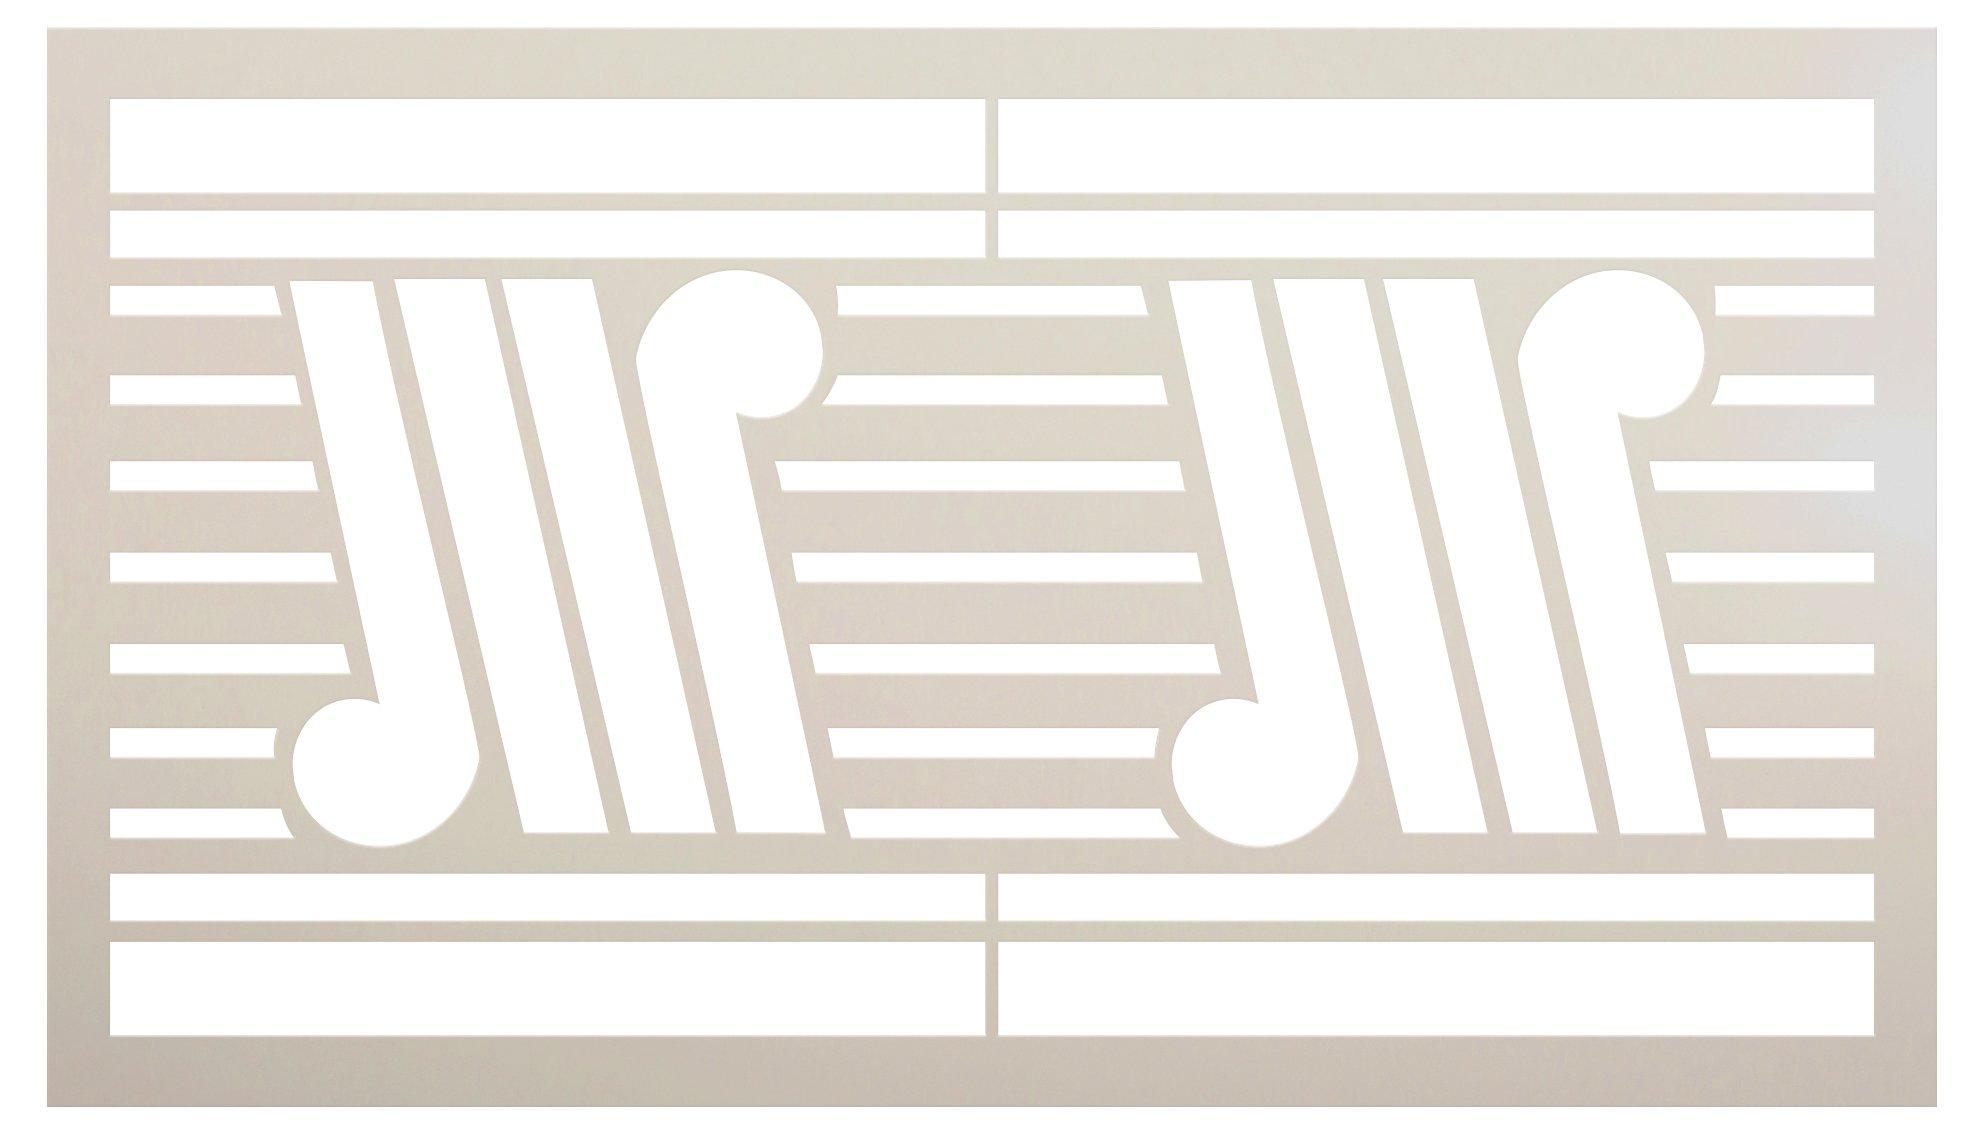 Stripe Tile Pattern Stencil by StudioR12 | DIY Greek Note Shape Backsplash Home Decor | Craft & Paint Wood Sign Reusable Mylar Template | Select Size